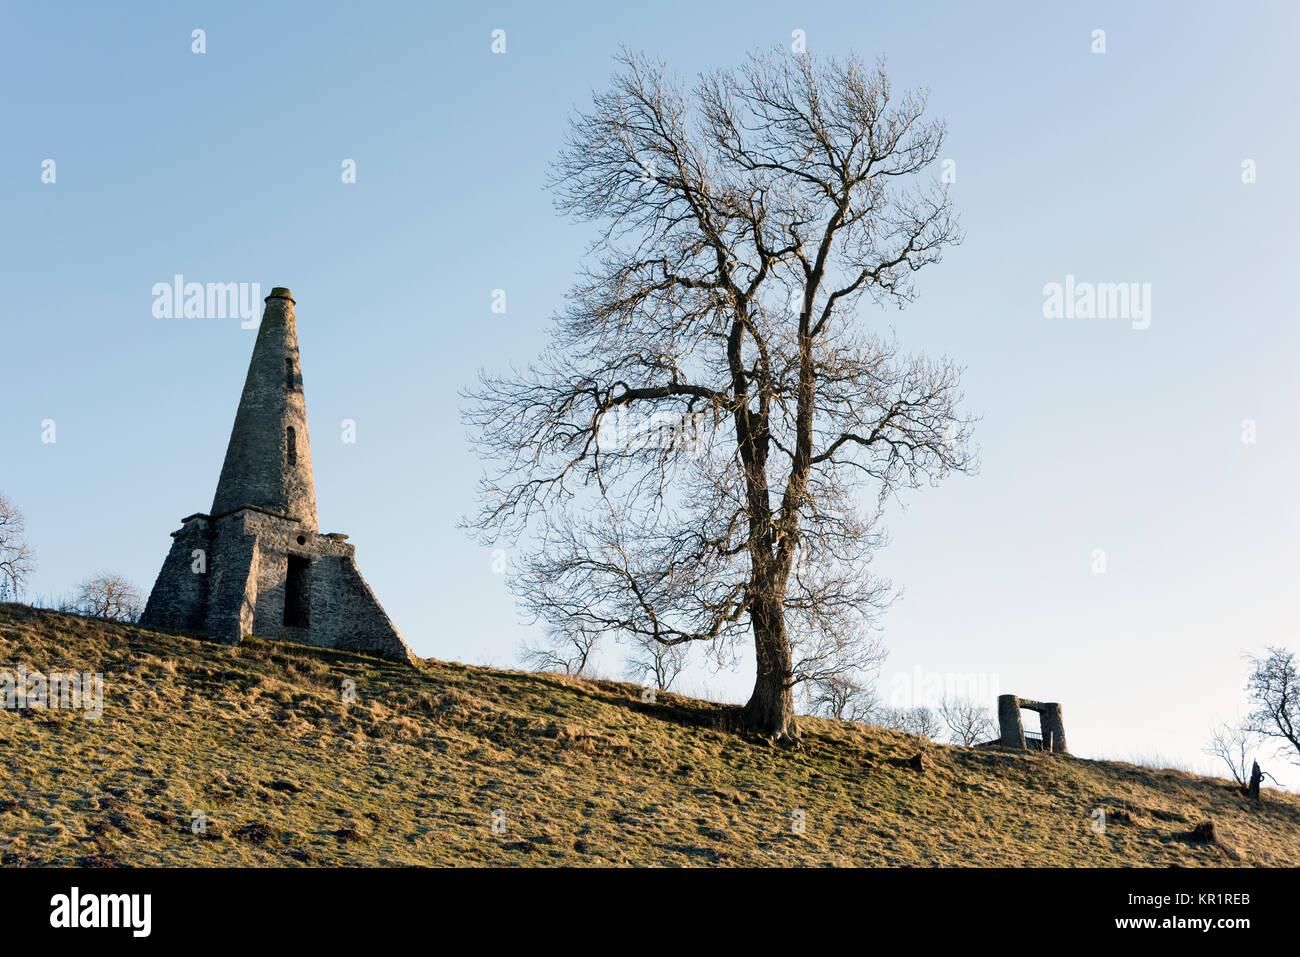 Frau Sykes' Unsinnigkeiten. Sorrelsykes Park, Edgley, Aysgarth, Yorkshire Dales National Park, Großbritannien Stockbild